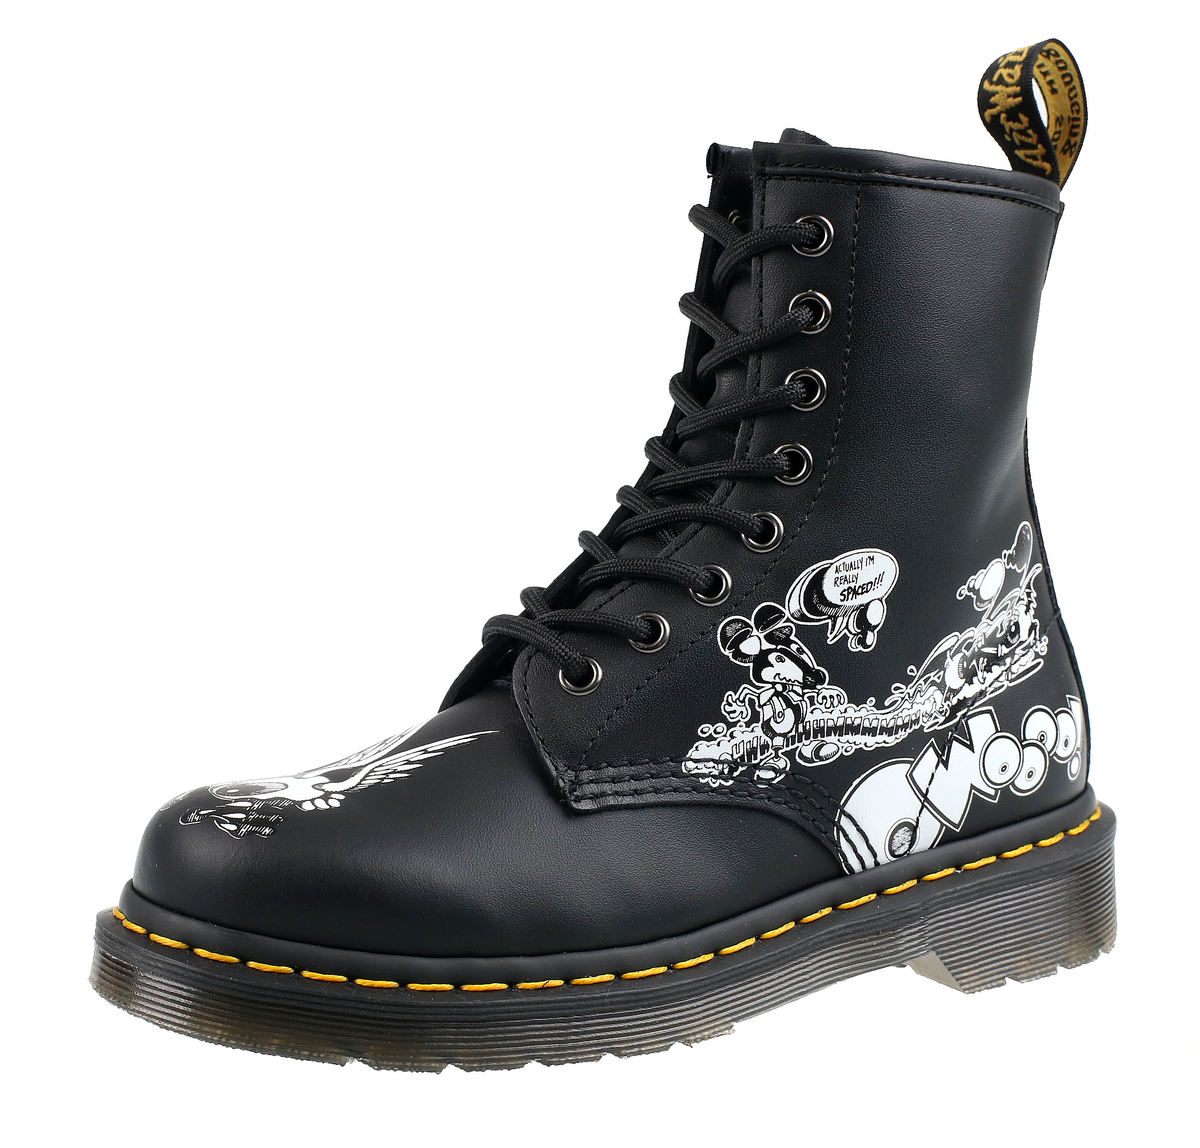 256ad268c9 topánky DR.MARTENS - 8 dierkové - RICK GRIFFIN BLACK WHITE ...